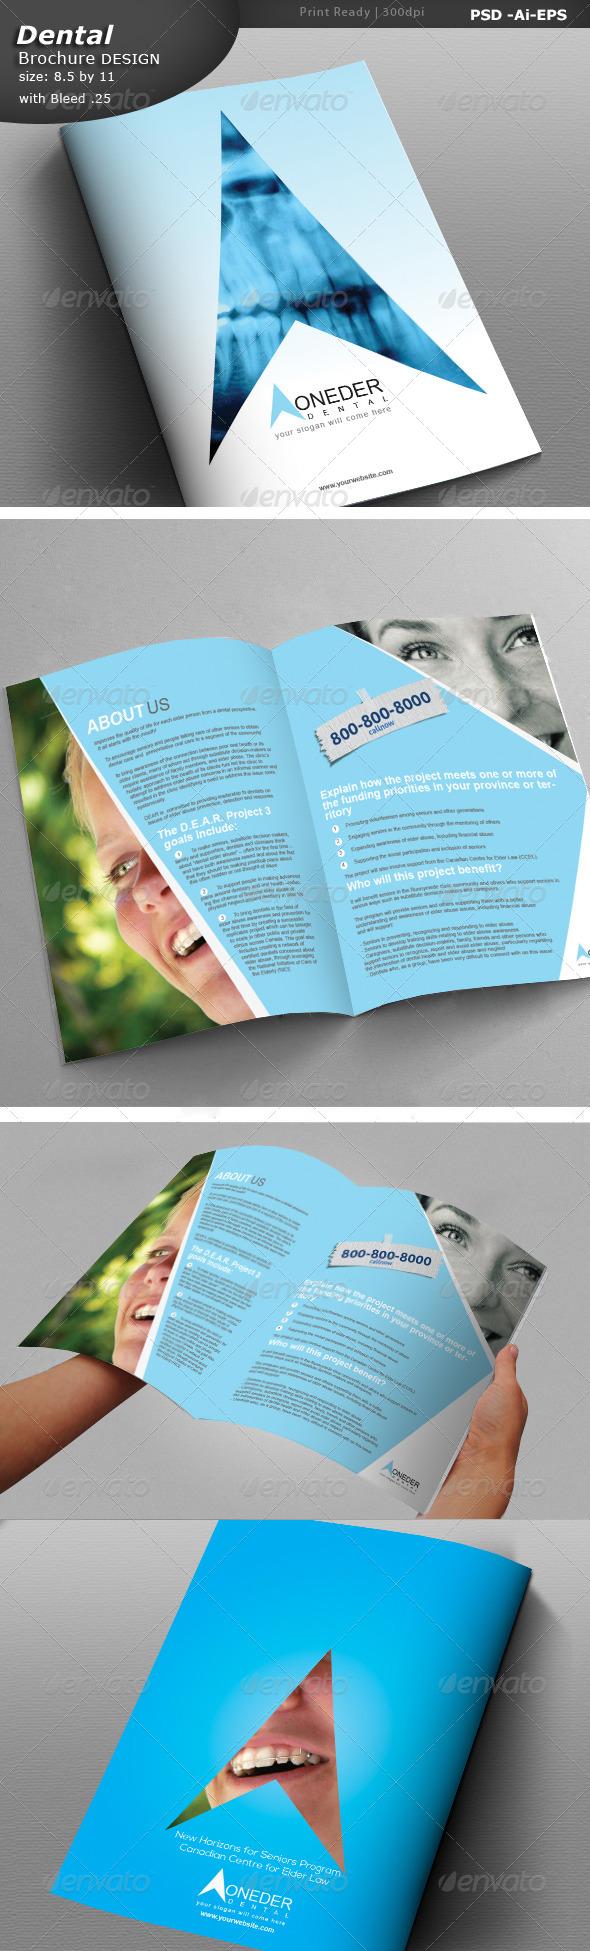 Dentist Brochure Design